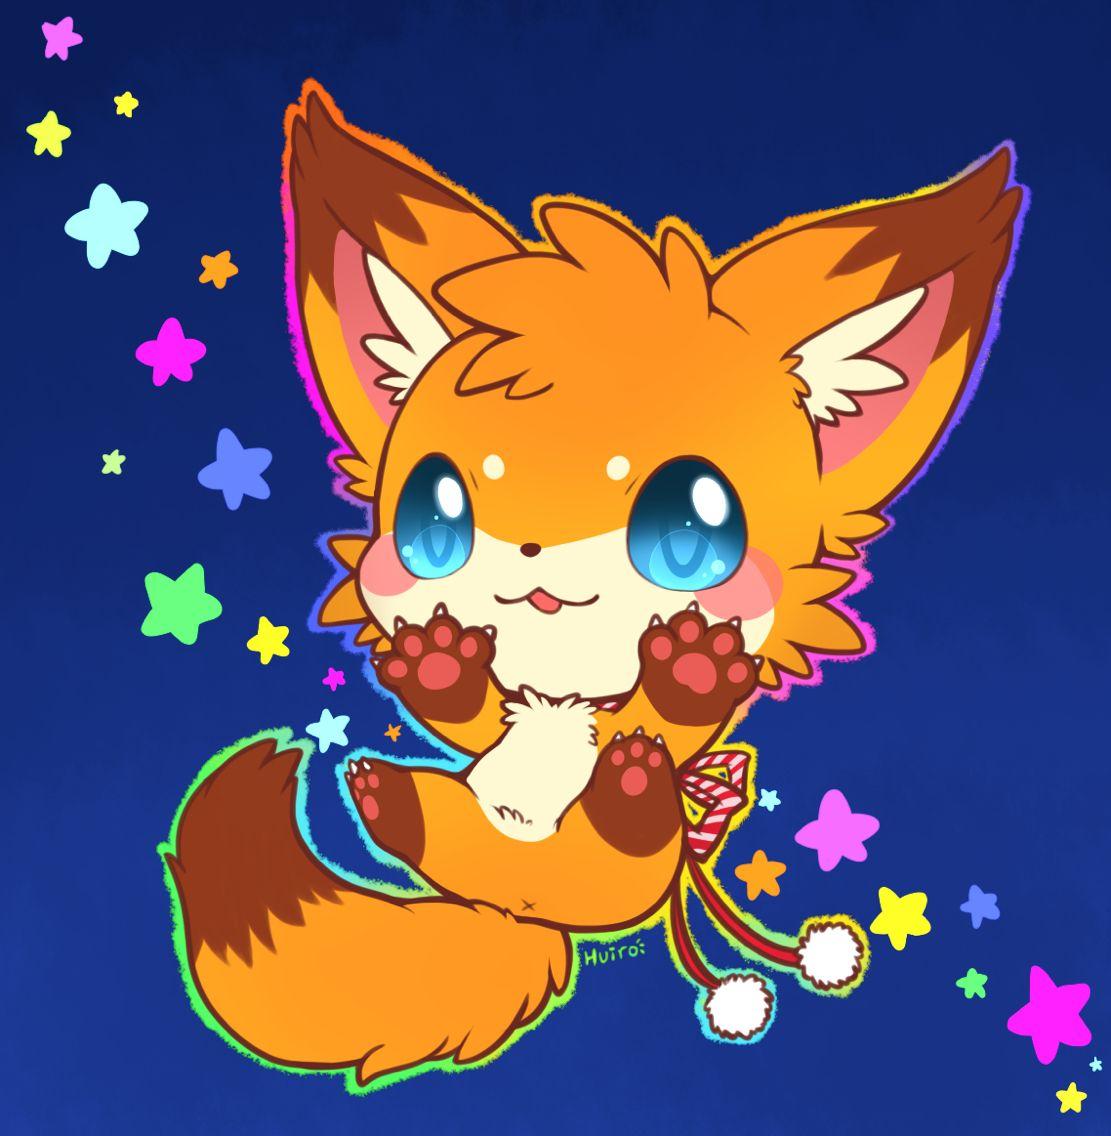 Jazz Paws By Huiro Cute Animal Drawings Kawaii Cute Fox Drawing Cute Animal Drawings